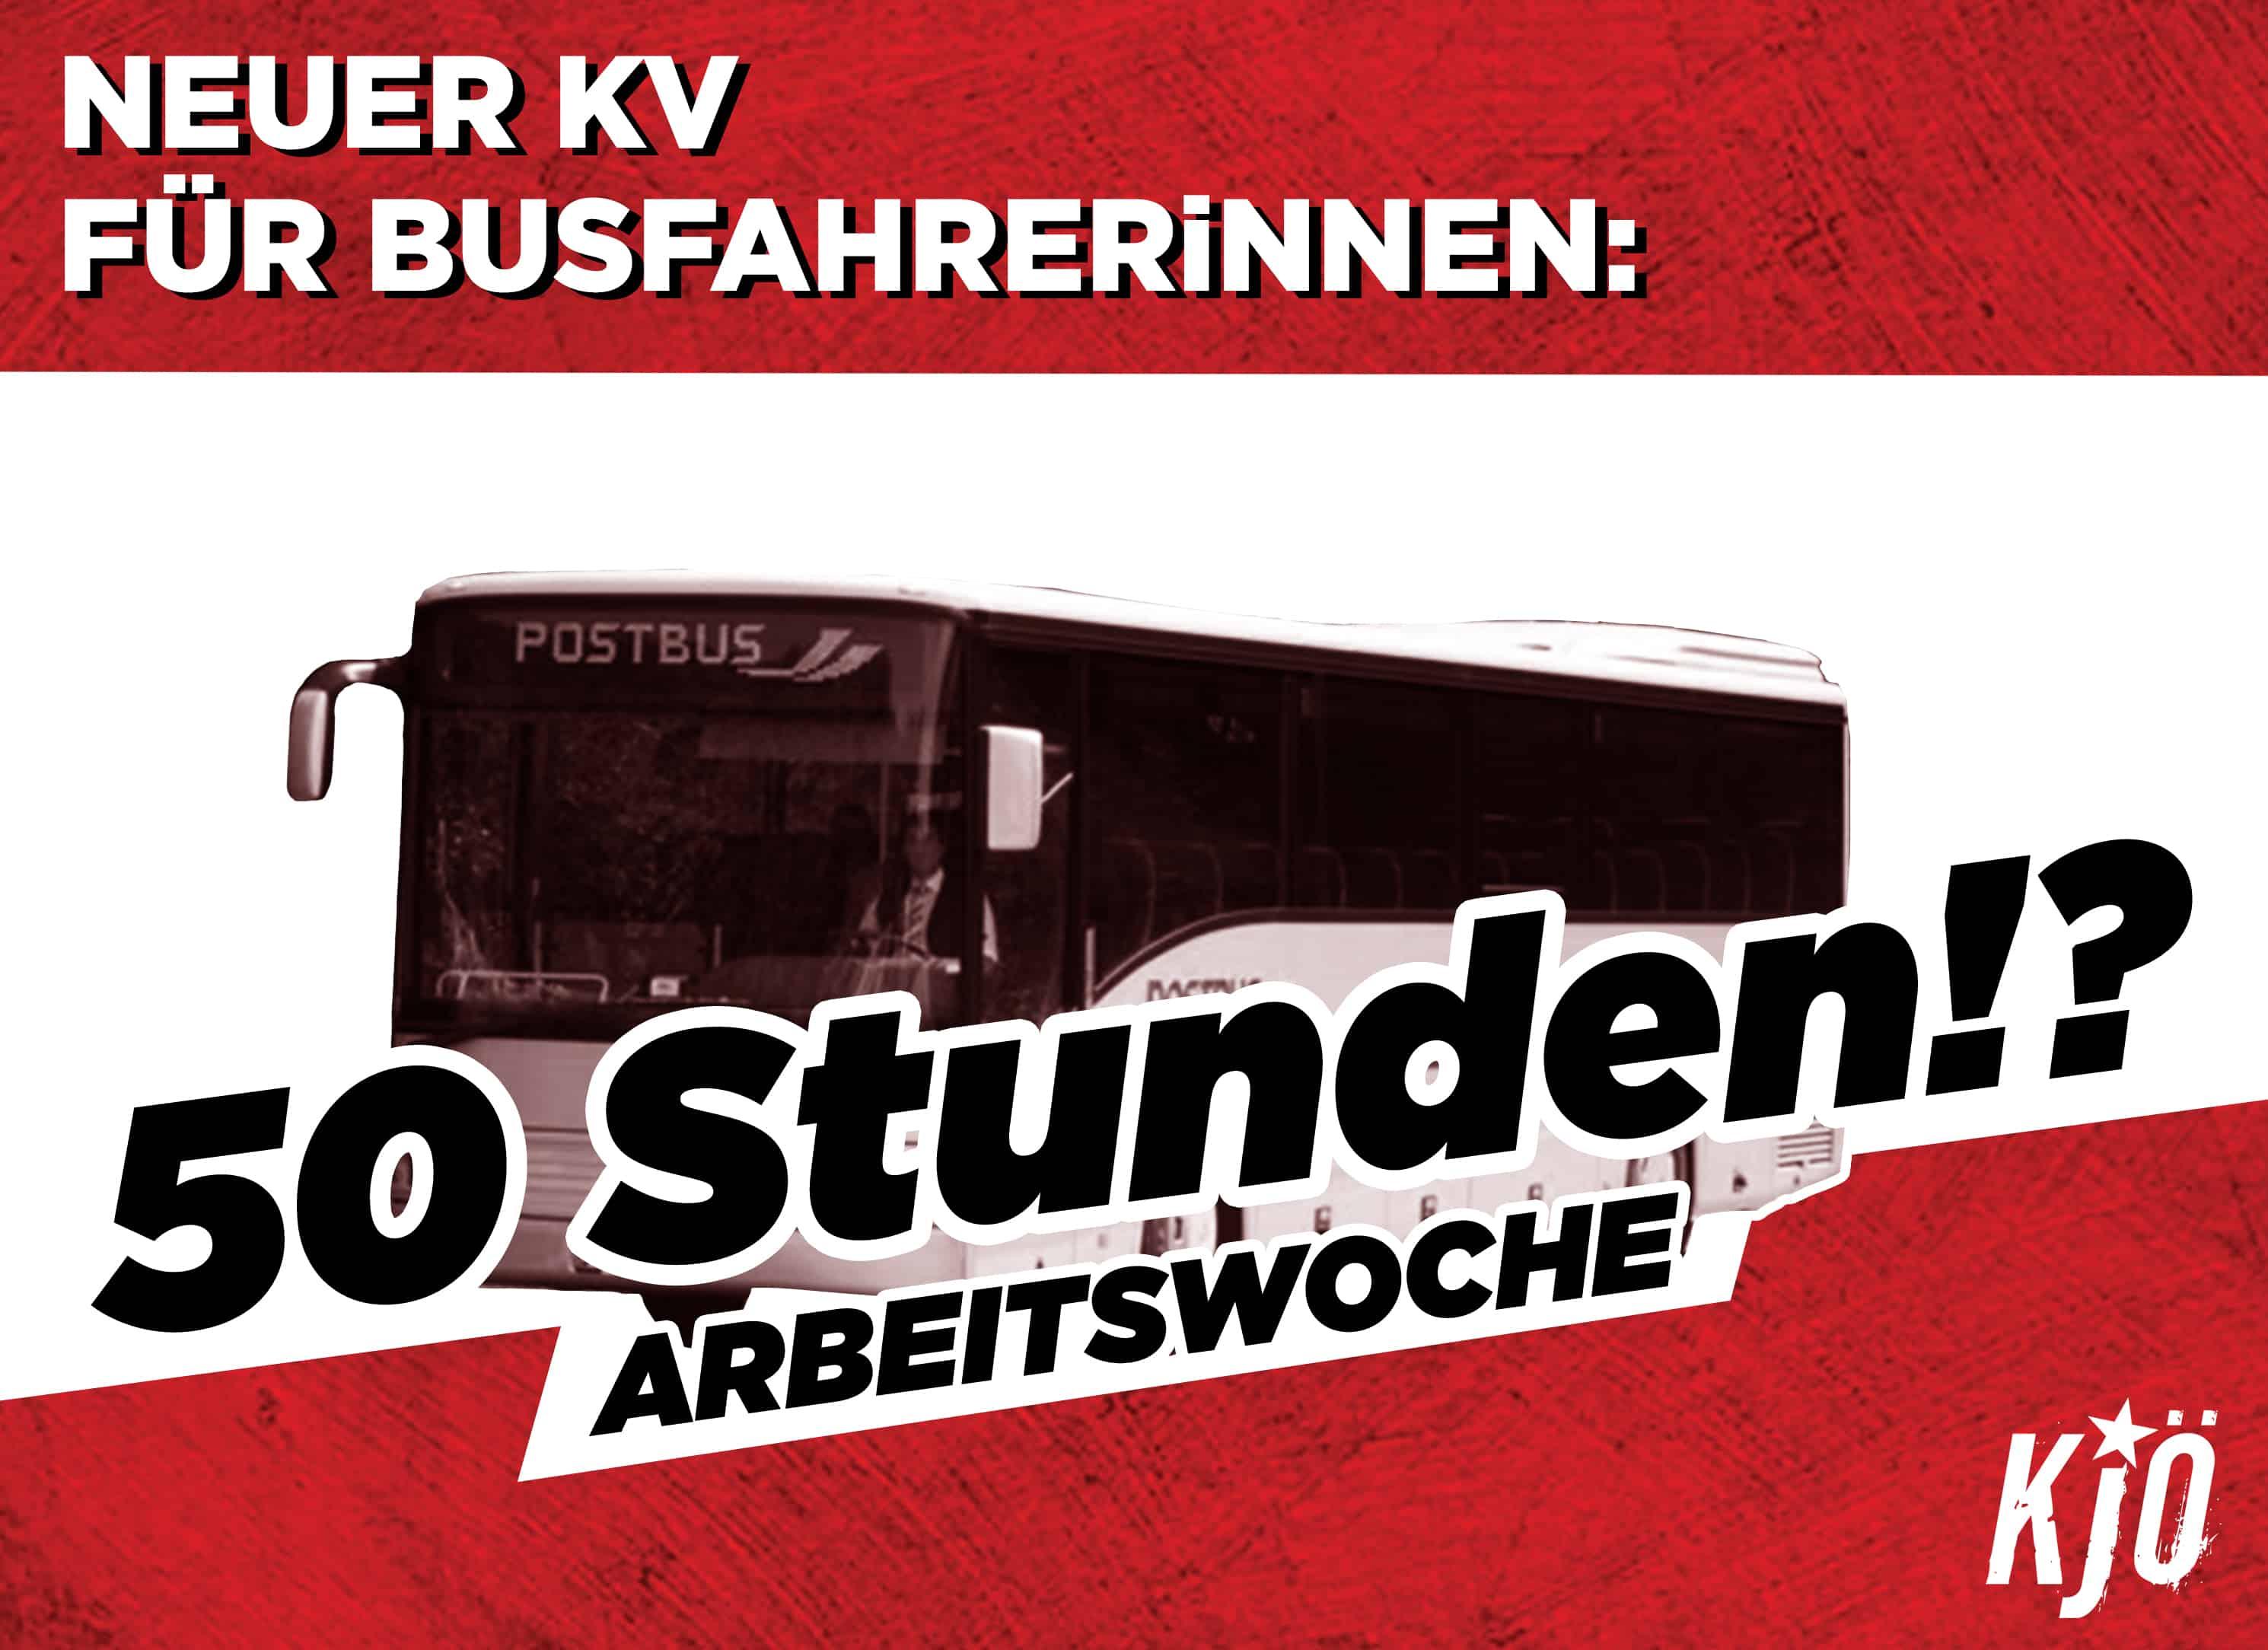 Kritik am neuen Kollektivvertrag für BusfahrerInnen wird laut